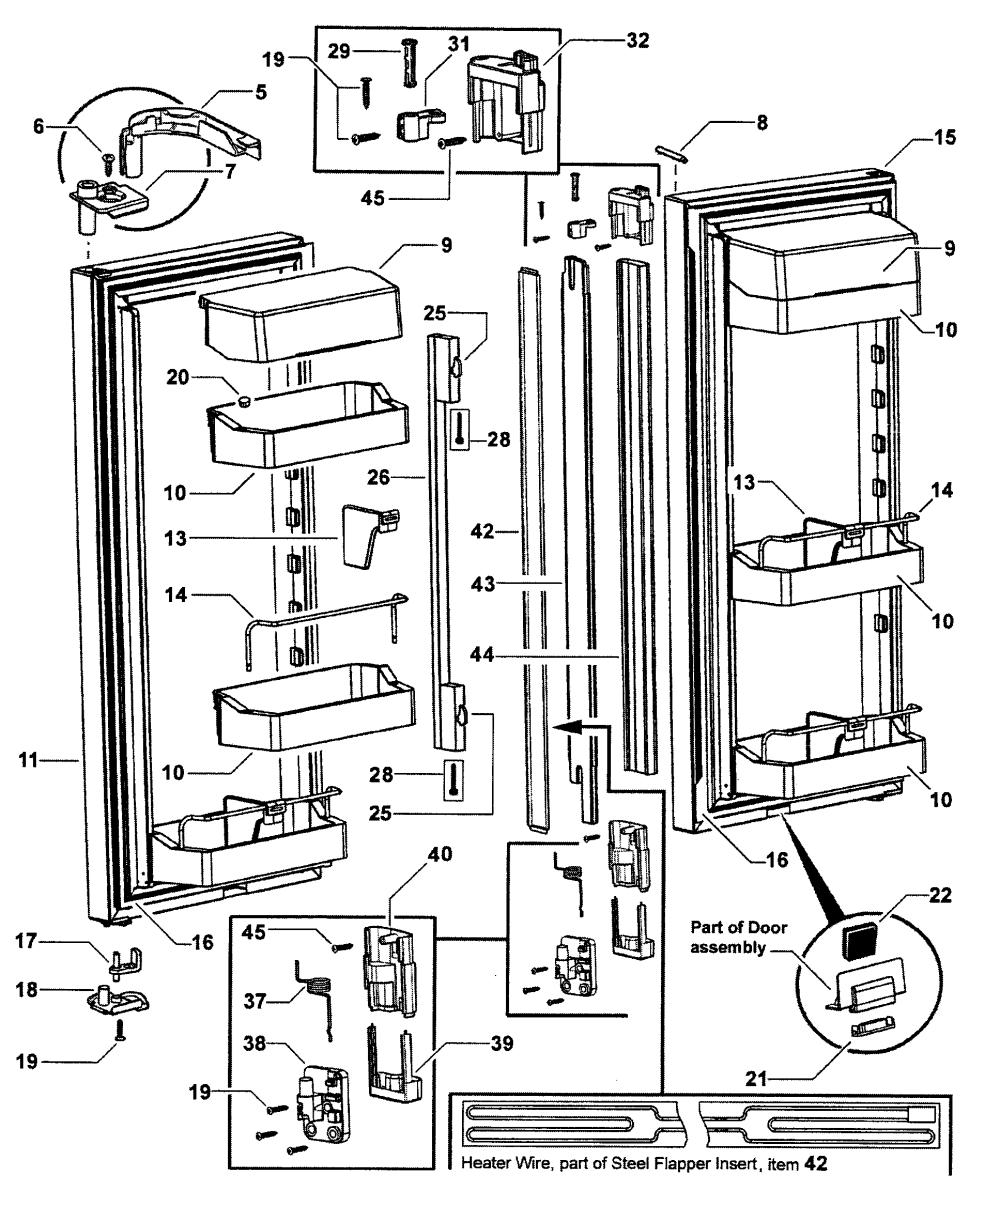 medium resolution of fisher paykel refrigerator wiring diagram wiring schematic diagramfisher paykel model rf201adux 22302a bottom mount refrigerator fisher